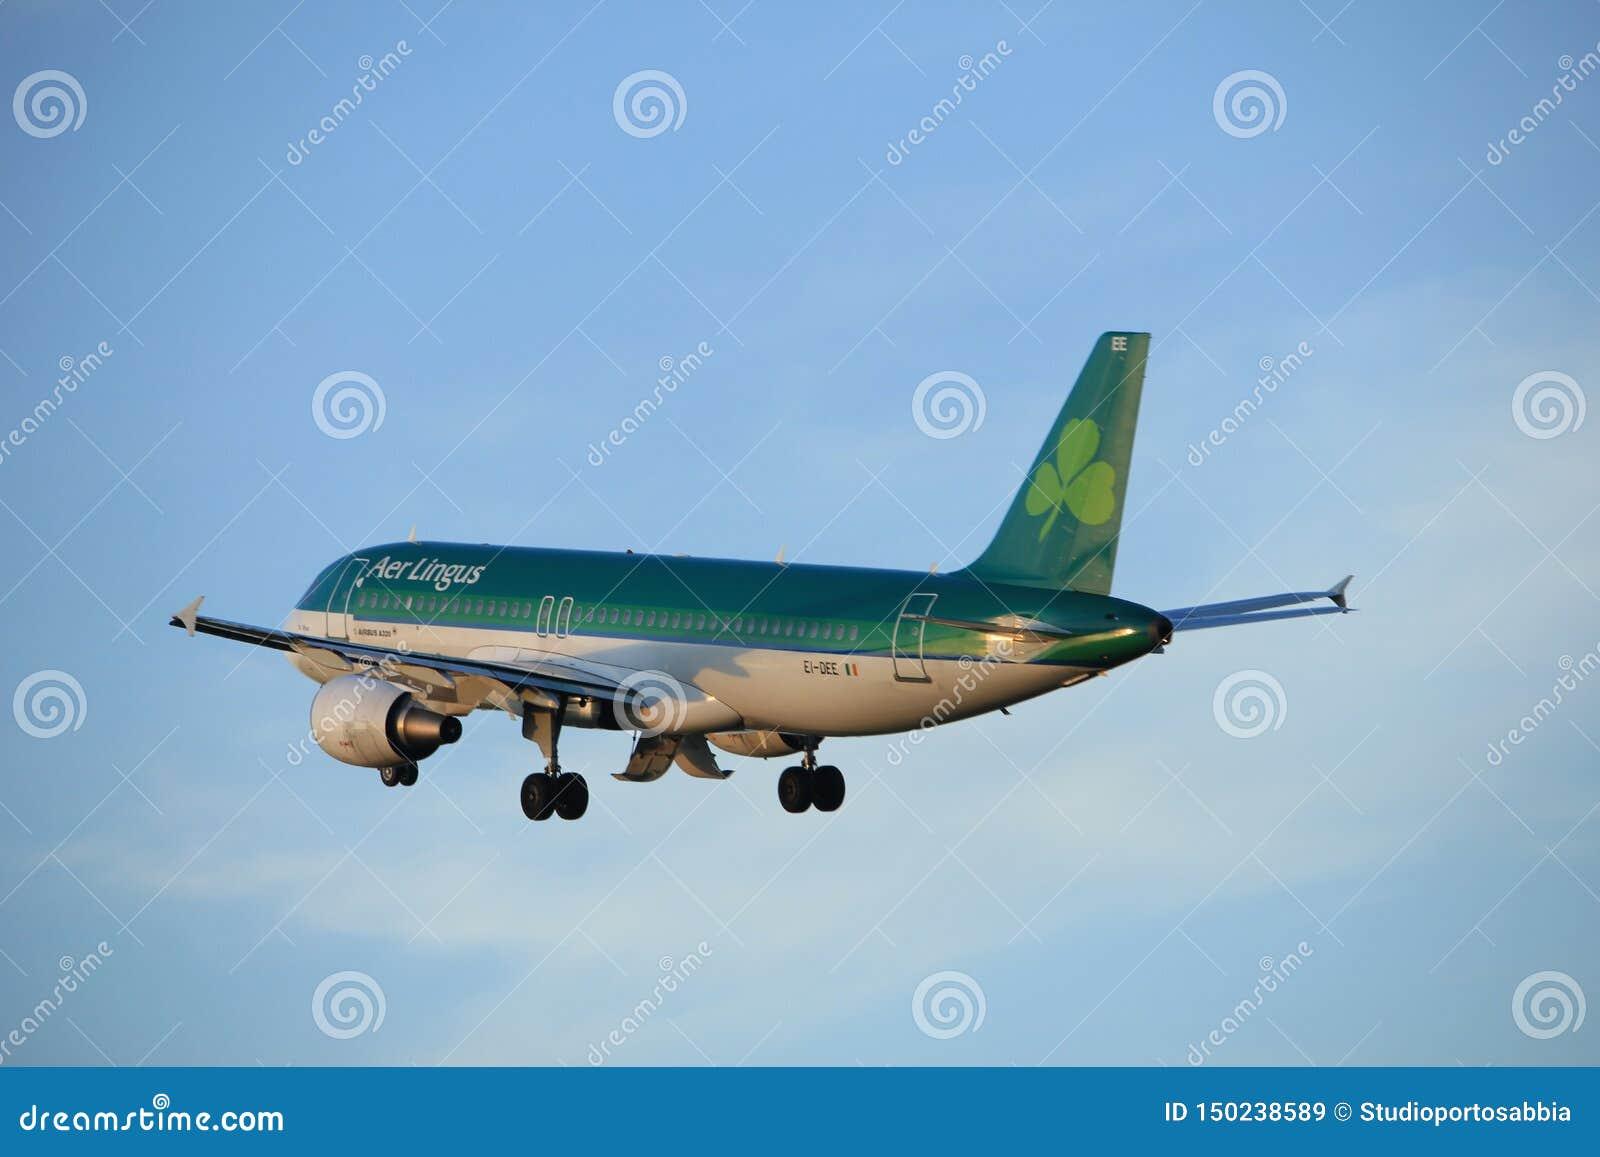 Amsterdam, the Netherlands  - June 1st, 2017: EI-DEE Aer Lingus Airbus